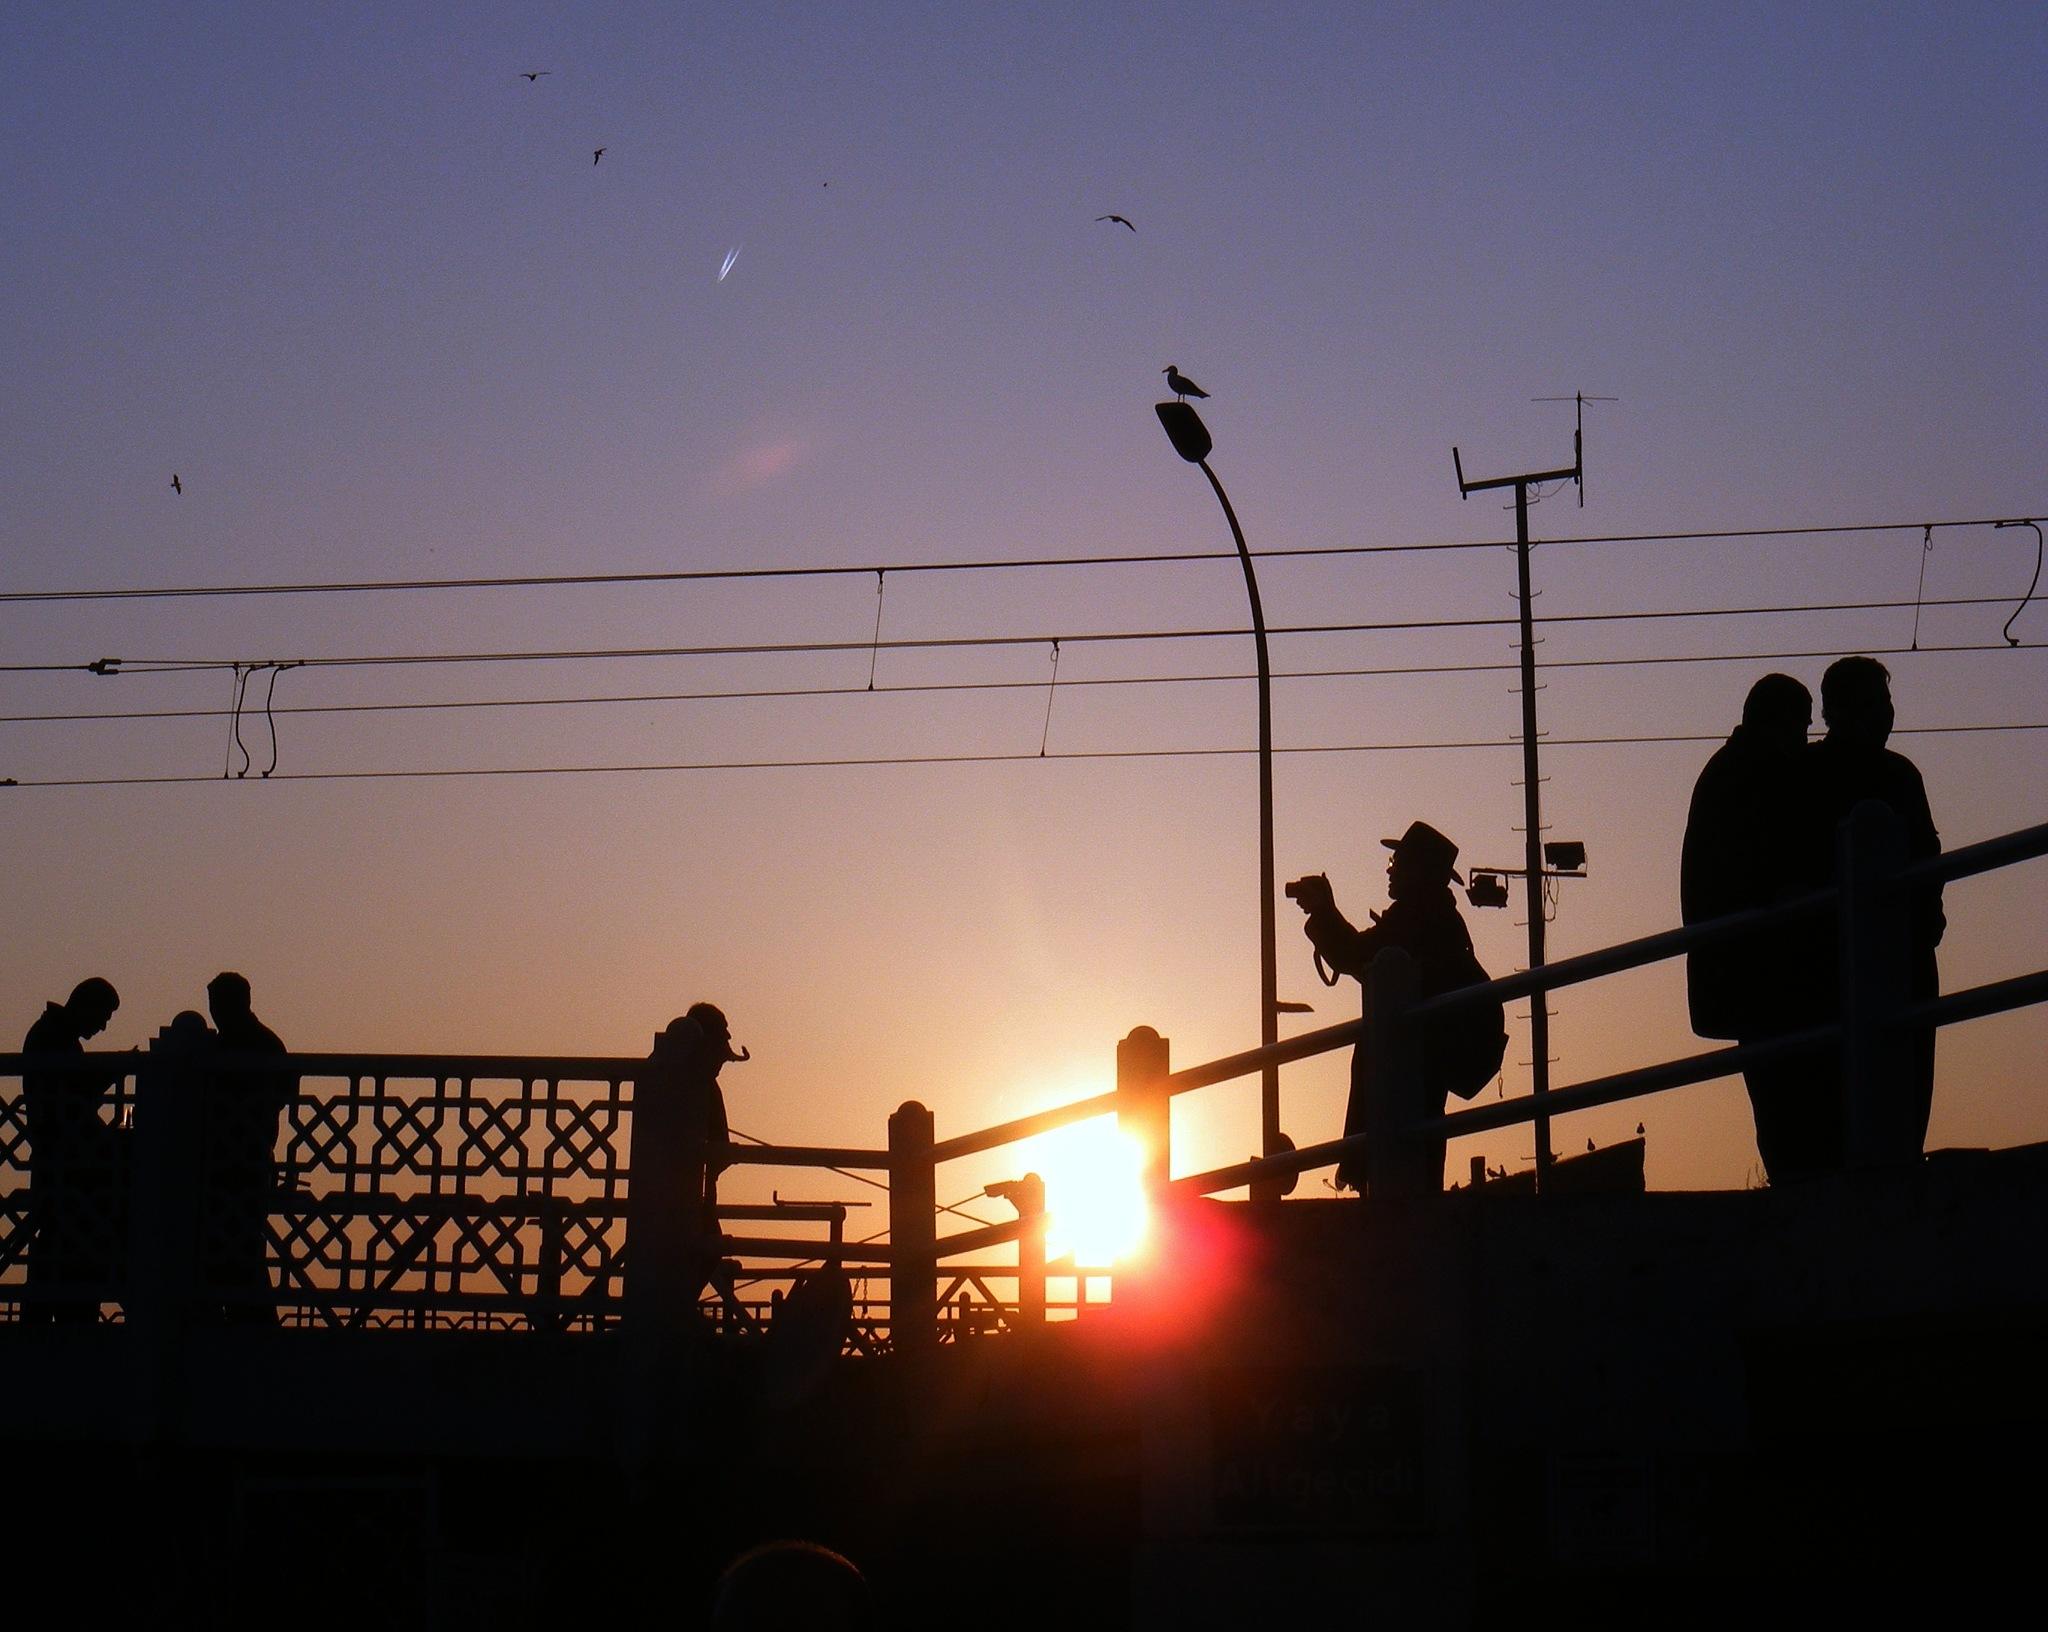 Sunset/2013 by Demet Alper